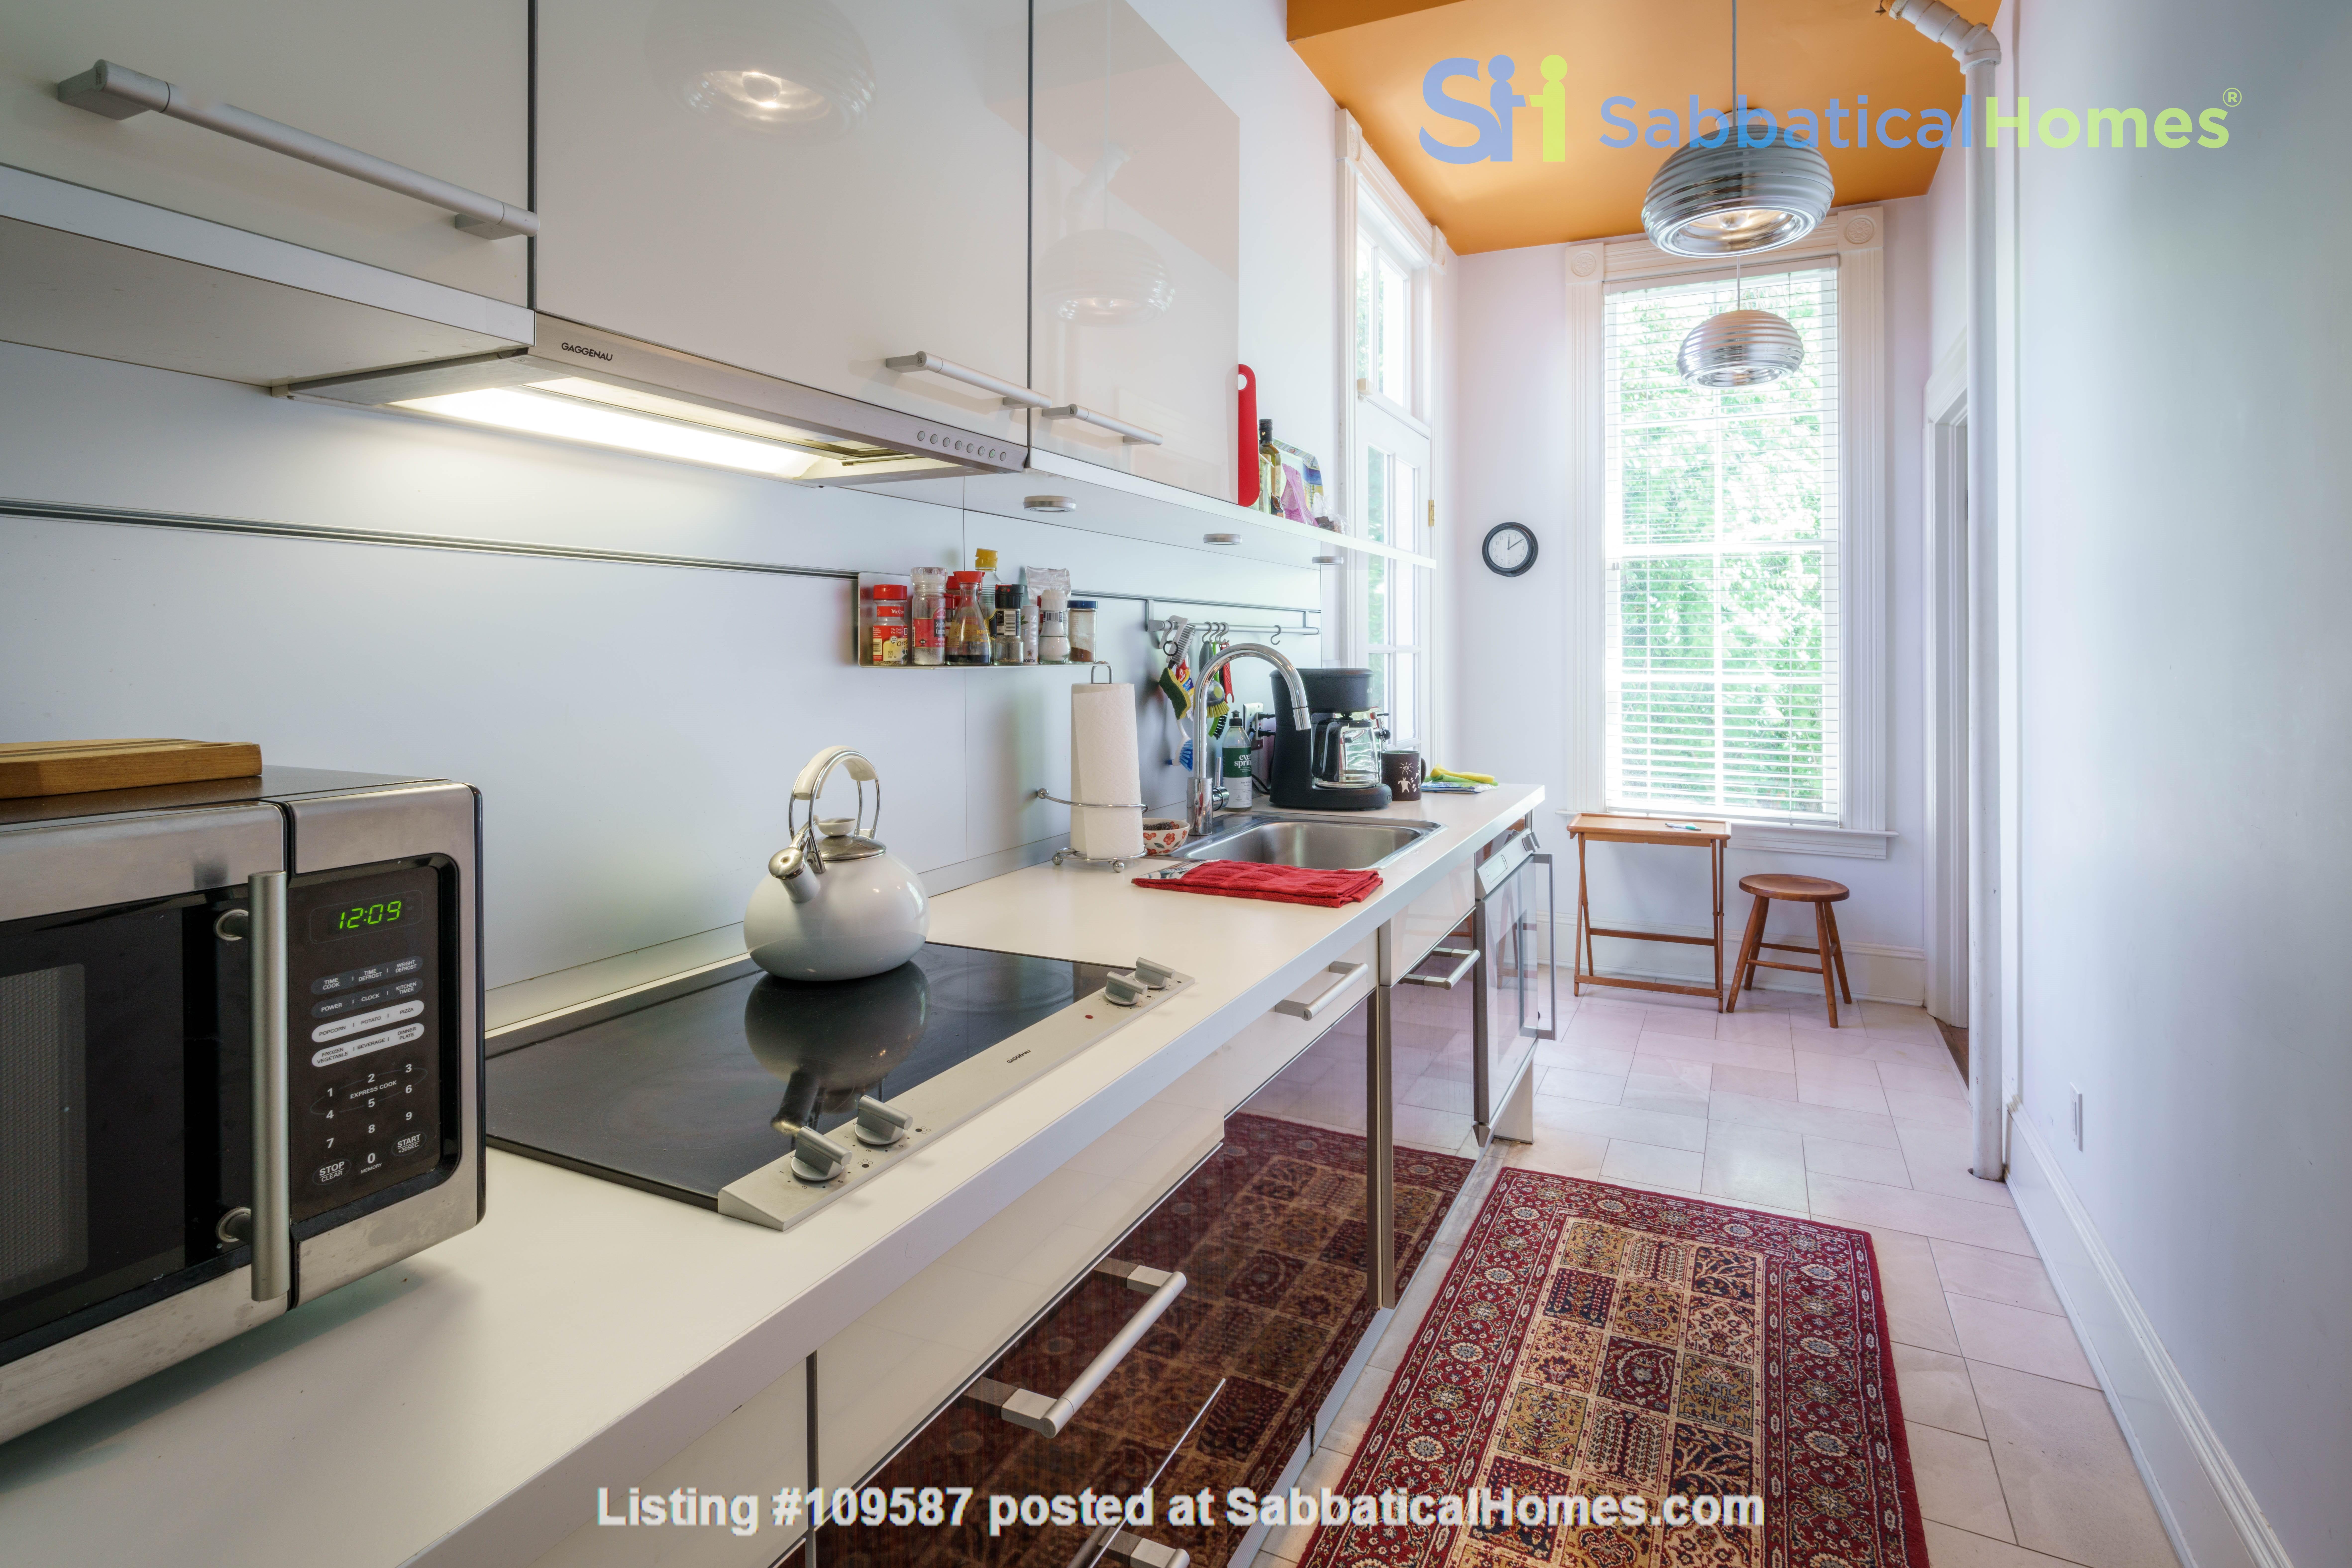 1335 Oxford Home Rental in Berkeley, California, United States 6